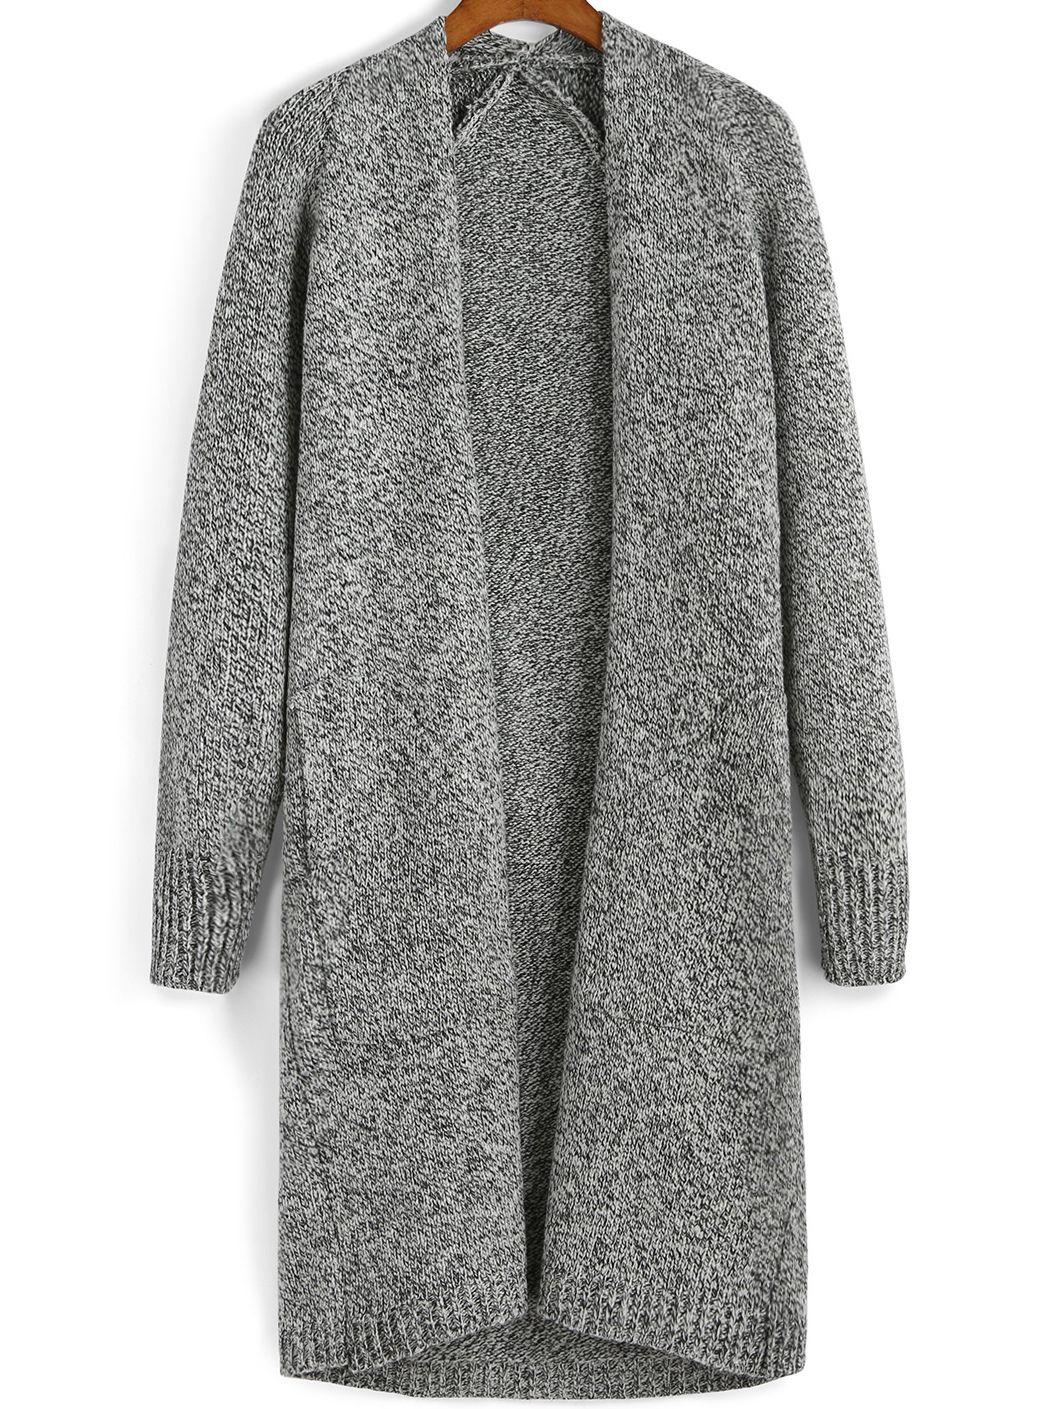 Grey Long Sleeve Knit Sweater Coat | Fall Wardrobe | Pinterest ...